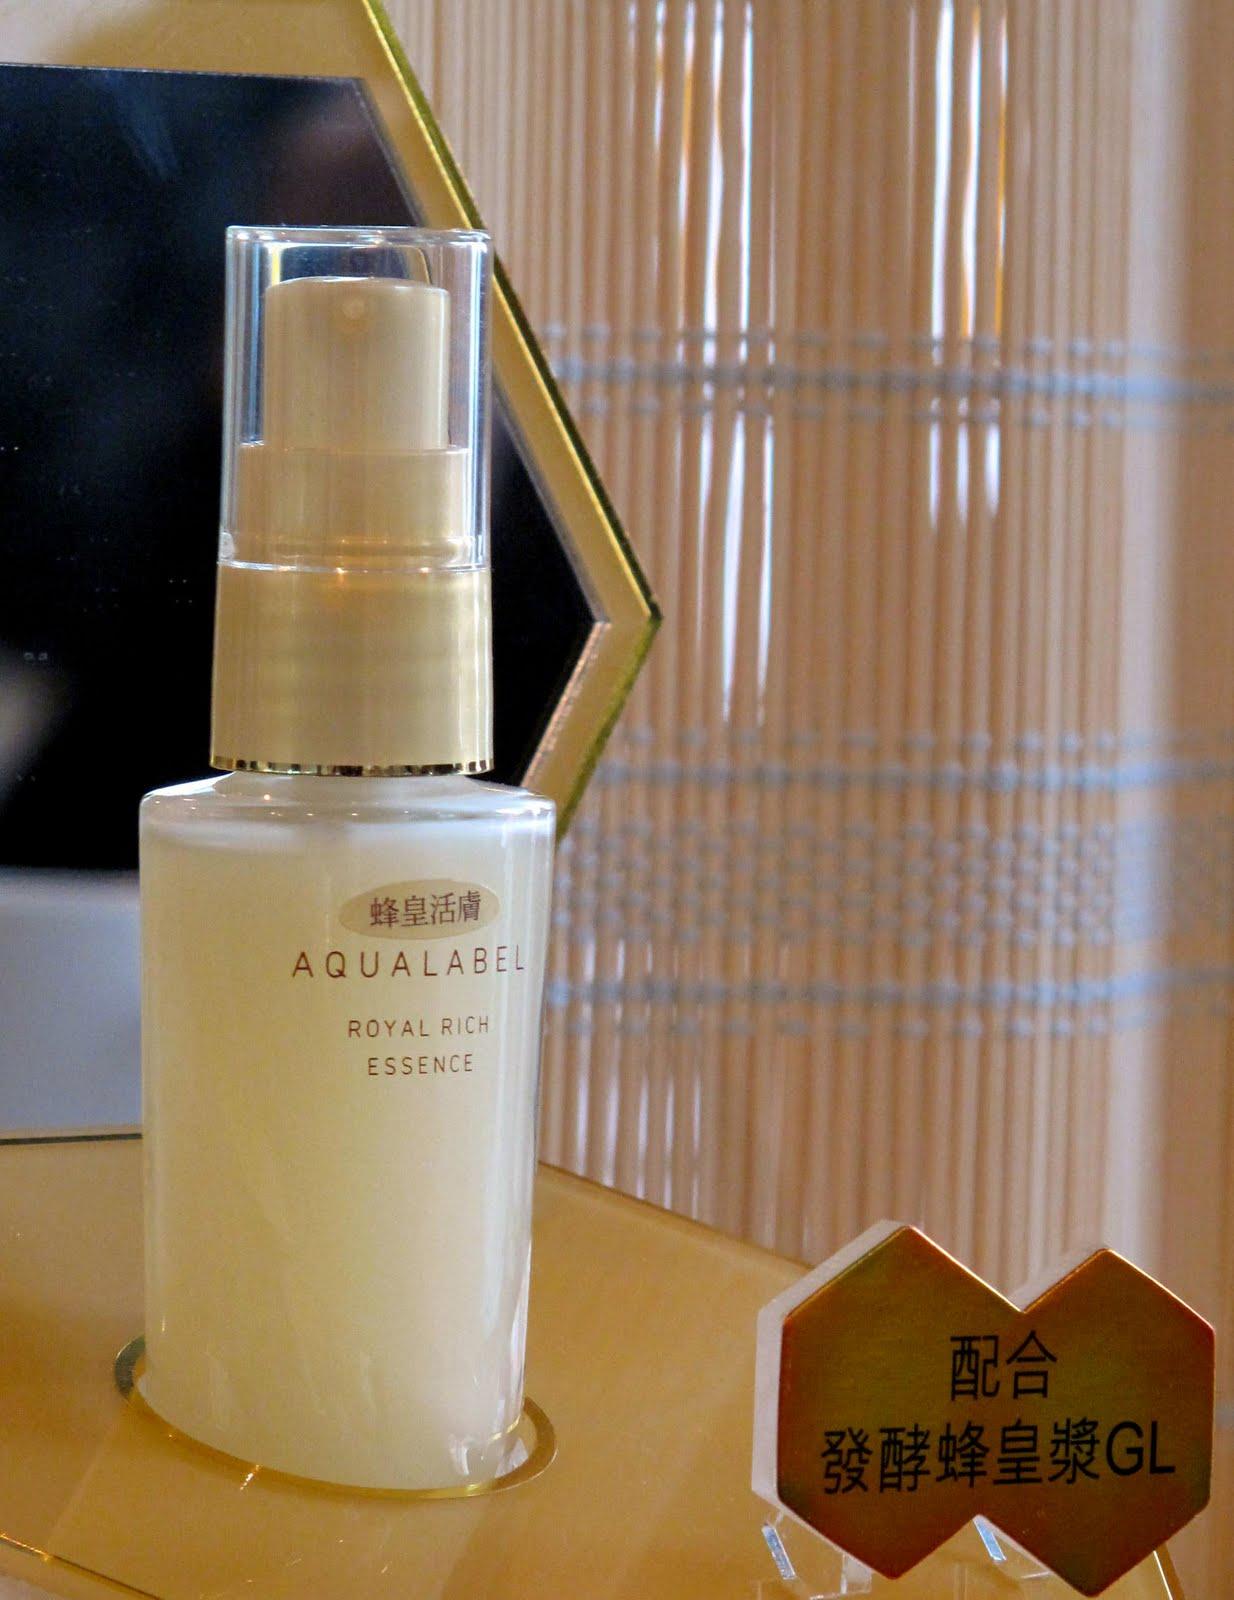 Aqualabel 蜂皇活膚精華 滋潤 補濕 緊緻